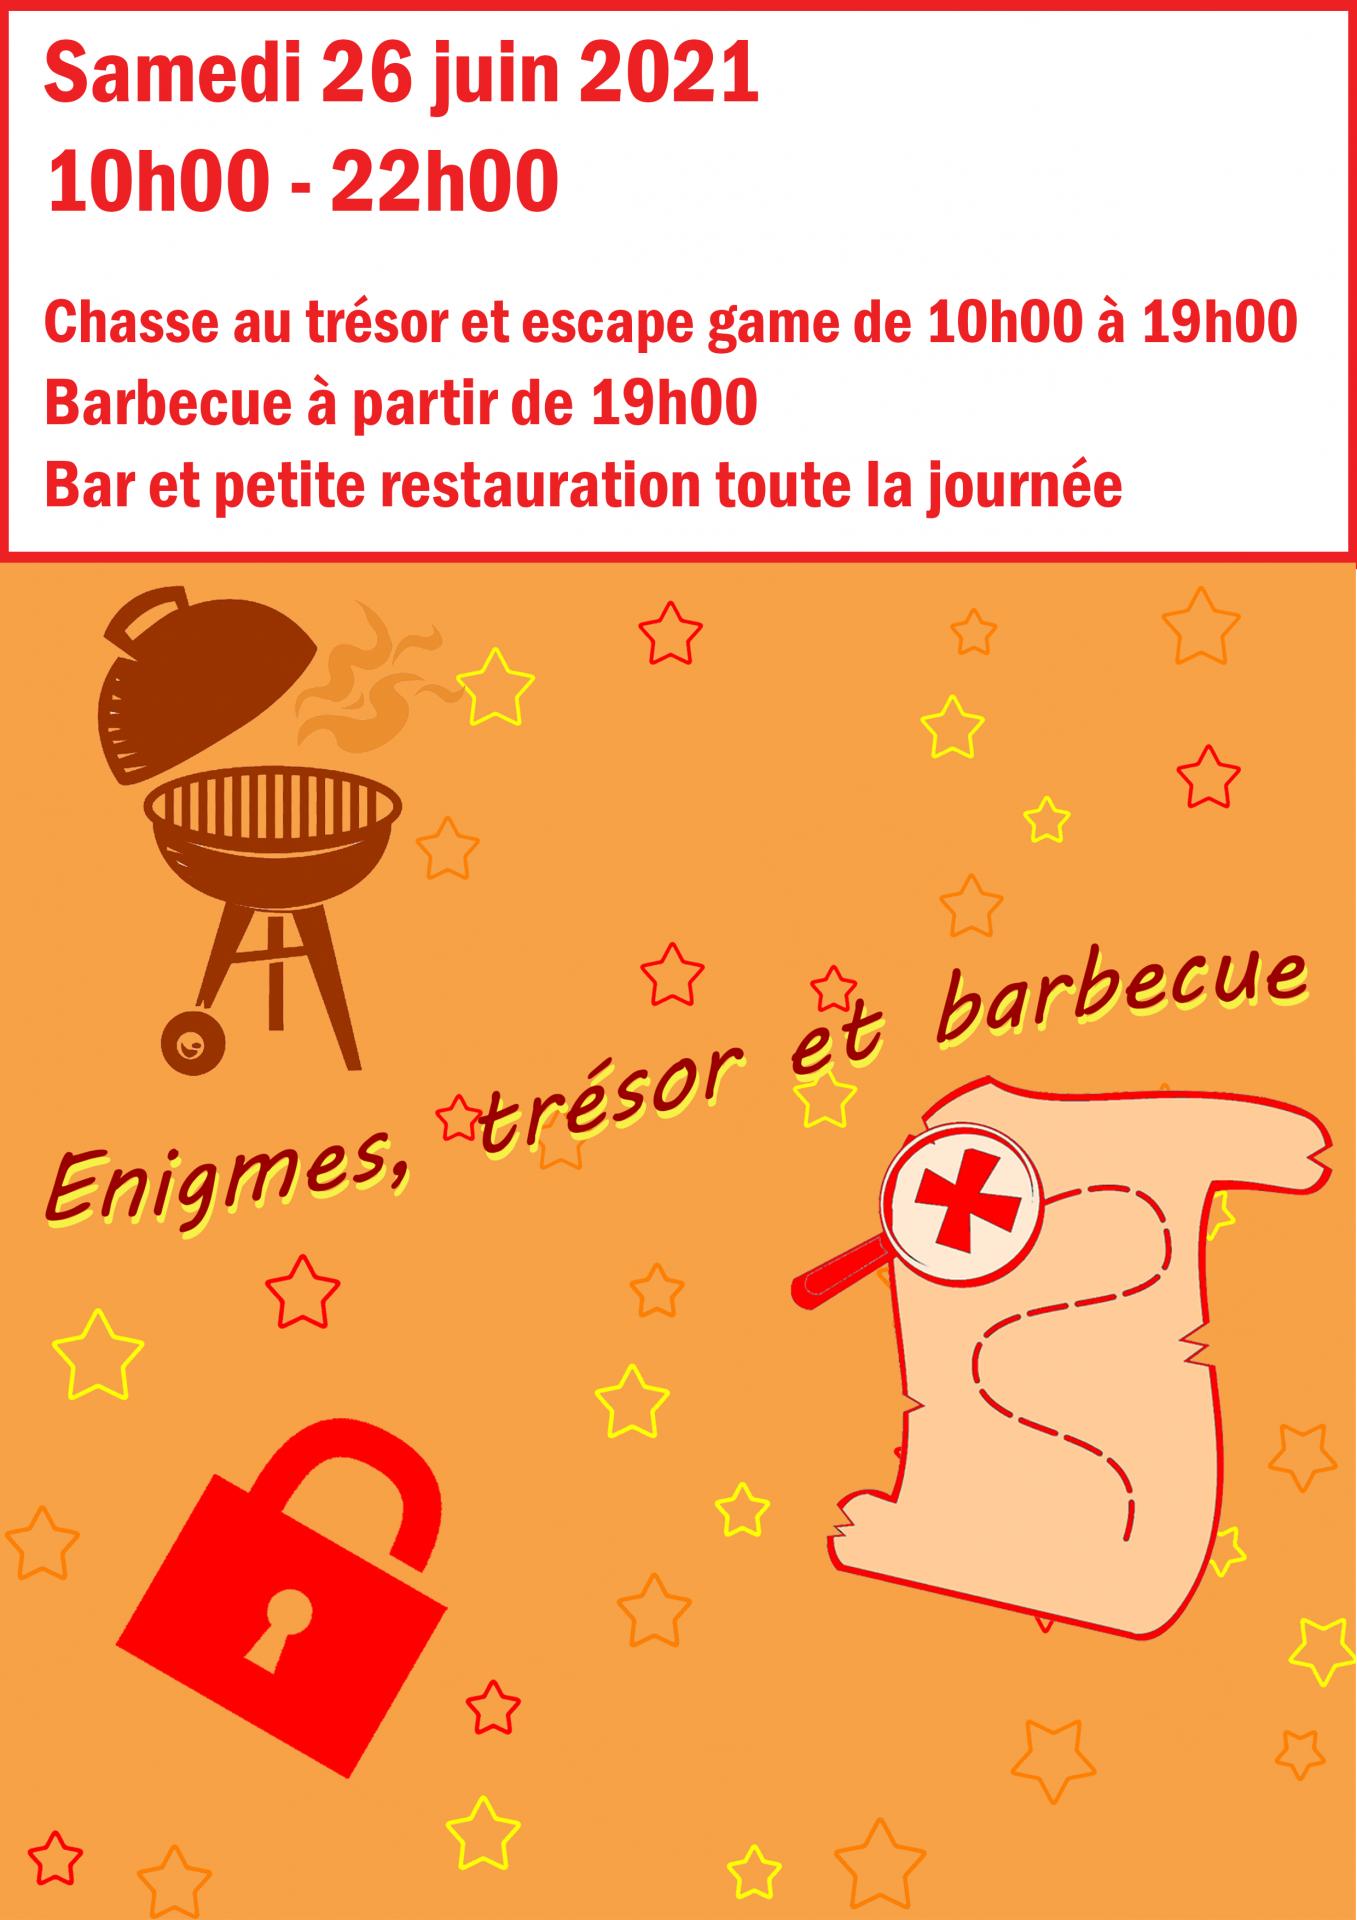 Enigmes, trésor et barbecue